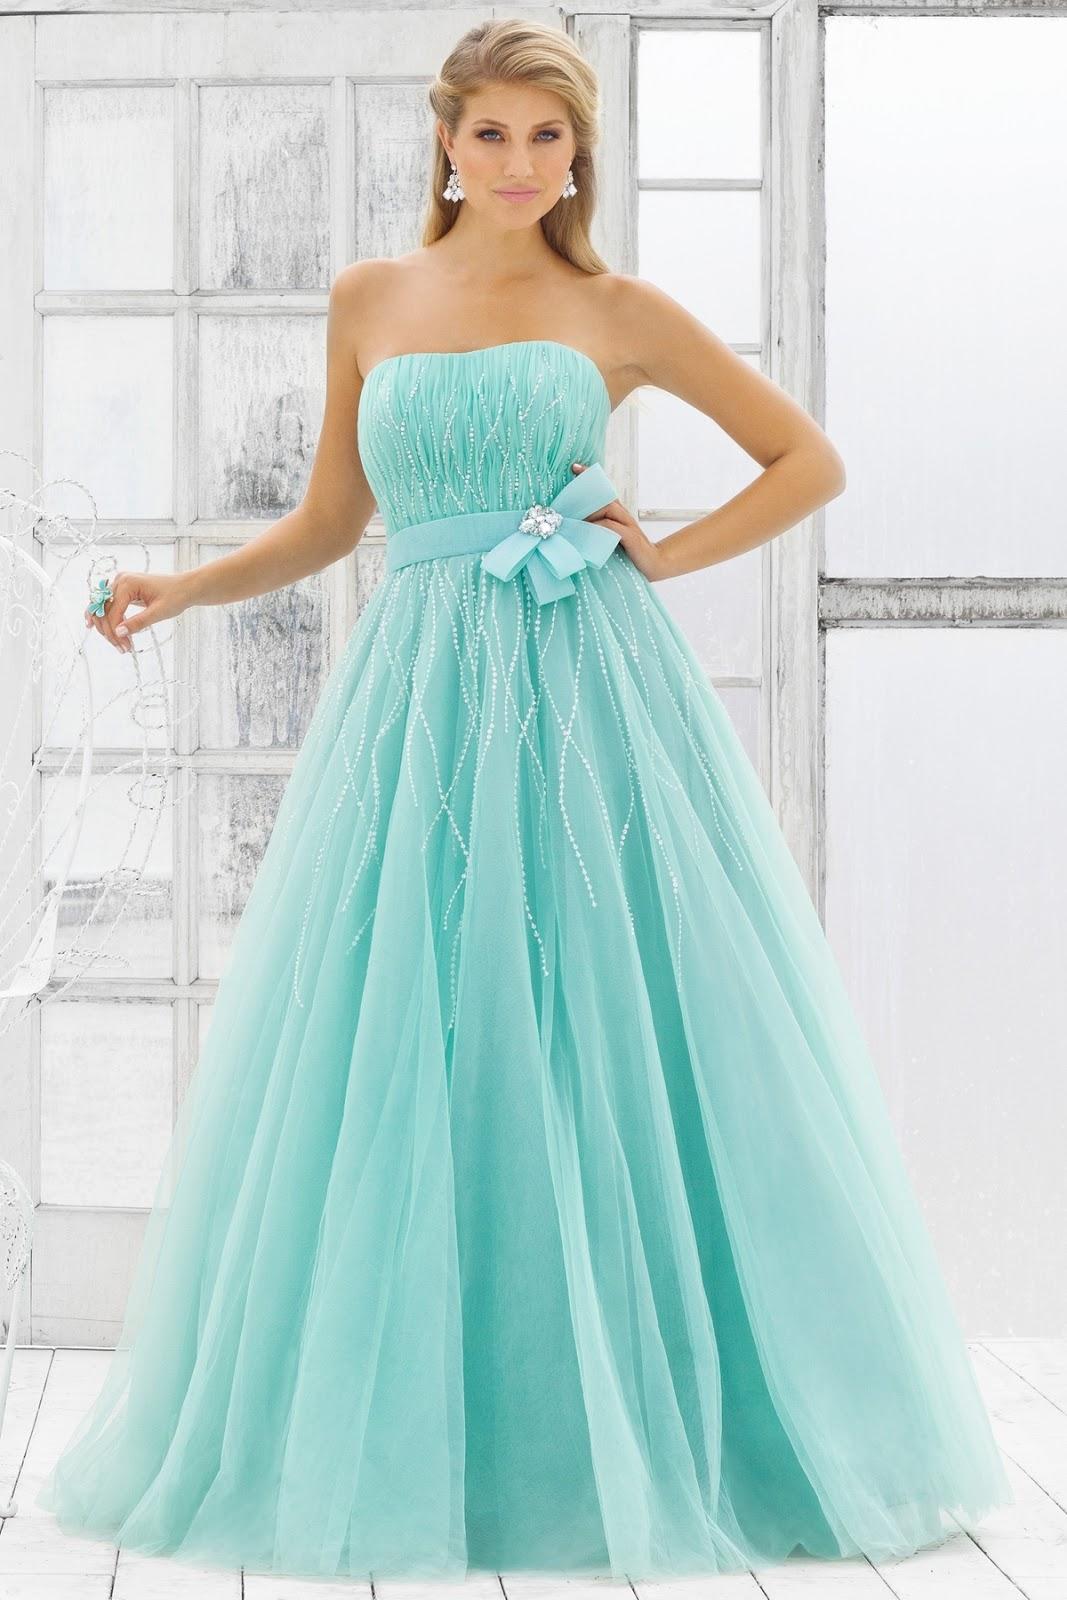 V.I.F (Very Important Fashionistas) by Jerseyfashionista: Curvy Prom ...